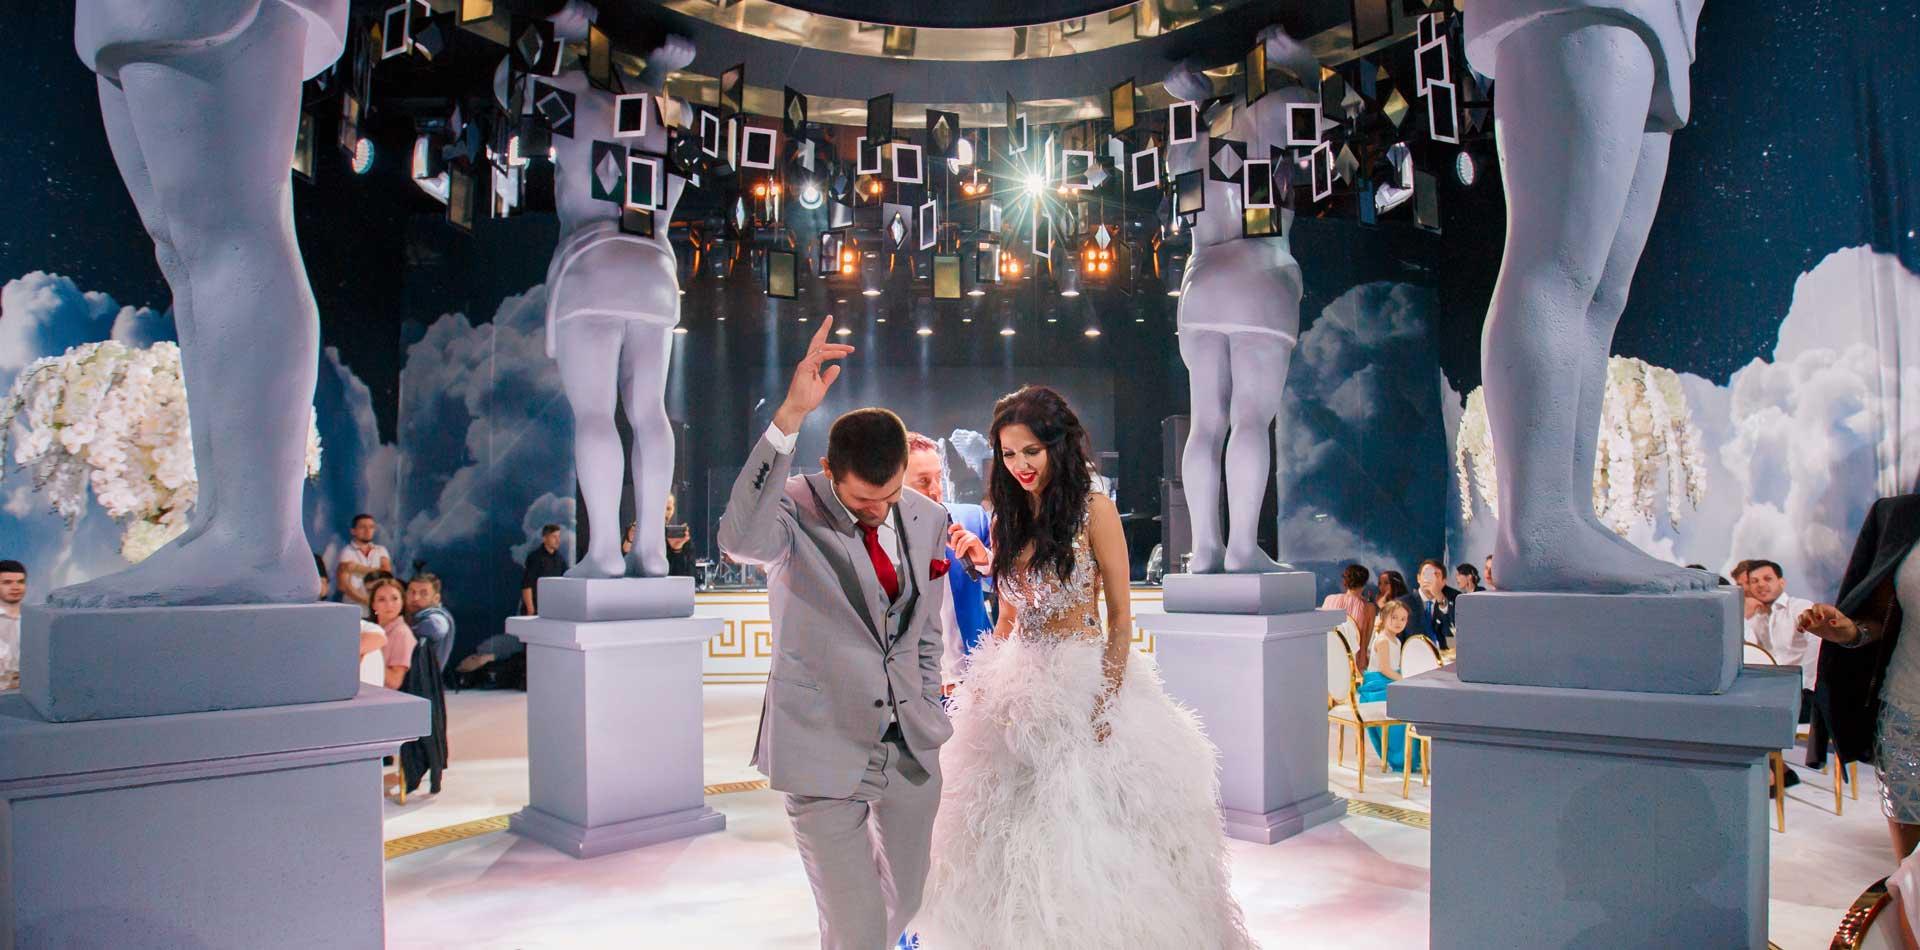 Свадьба александра радулова и дарьи дмитриевой фото